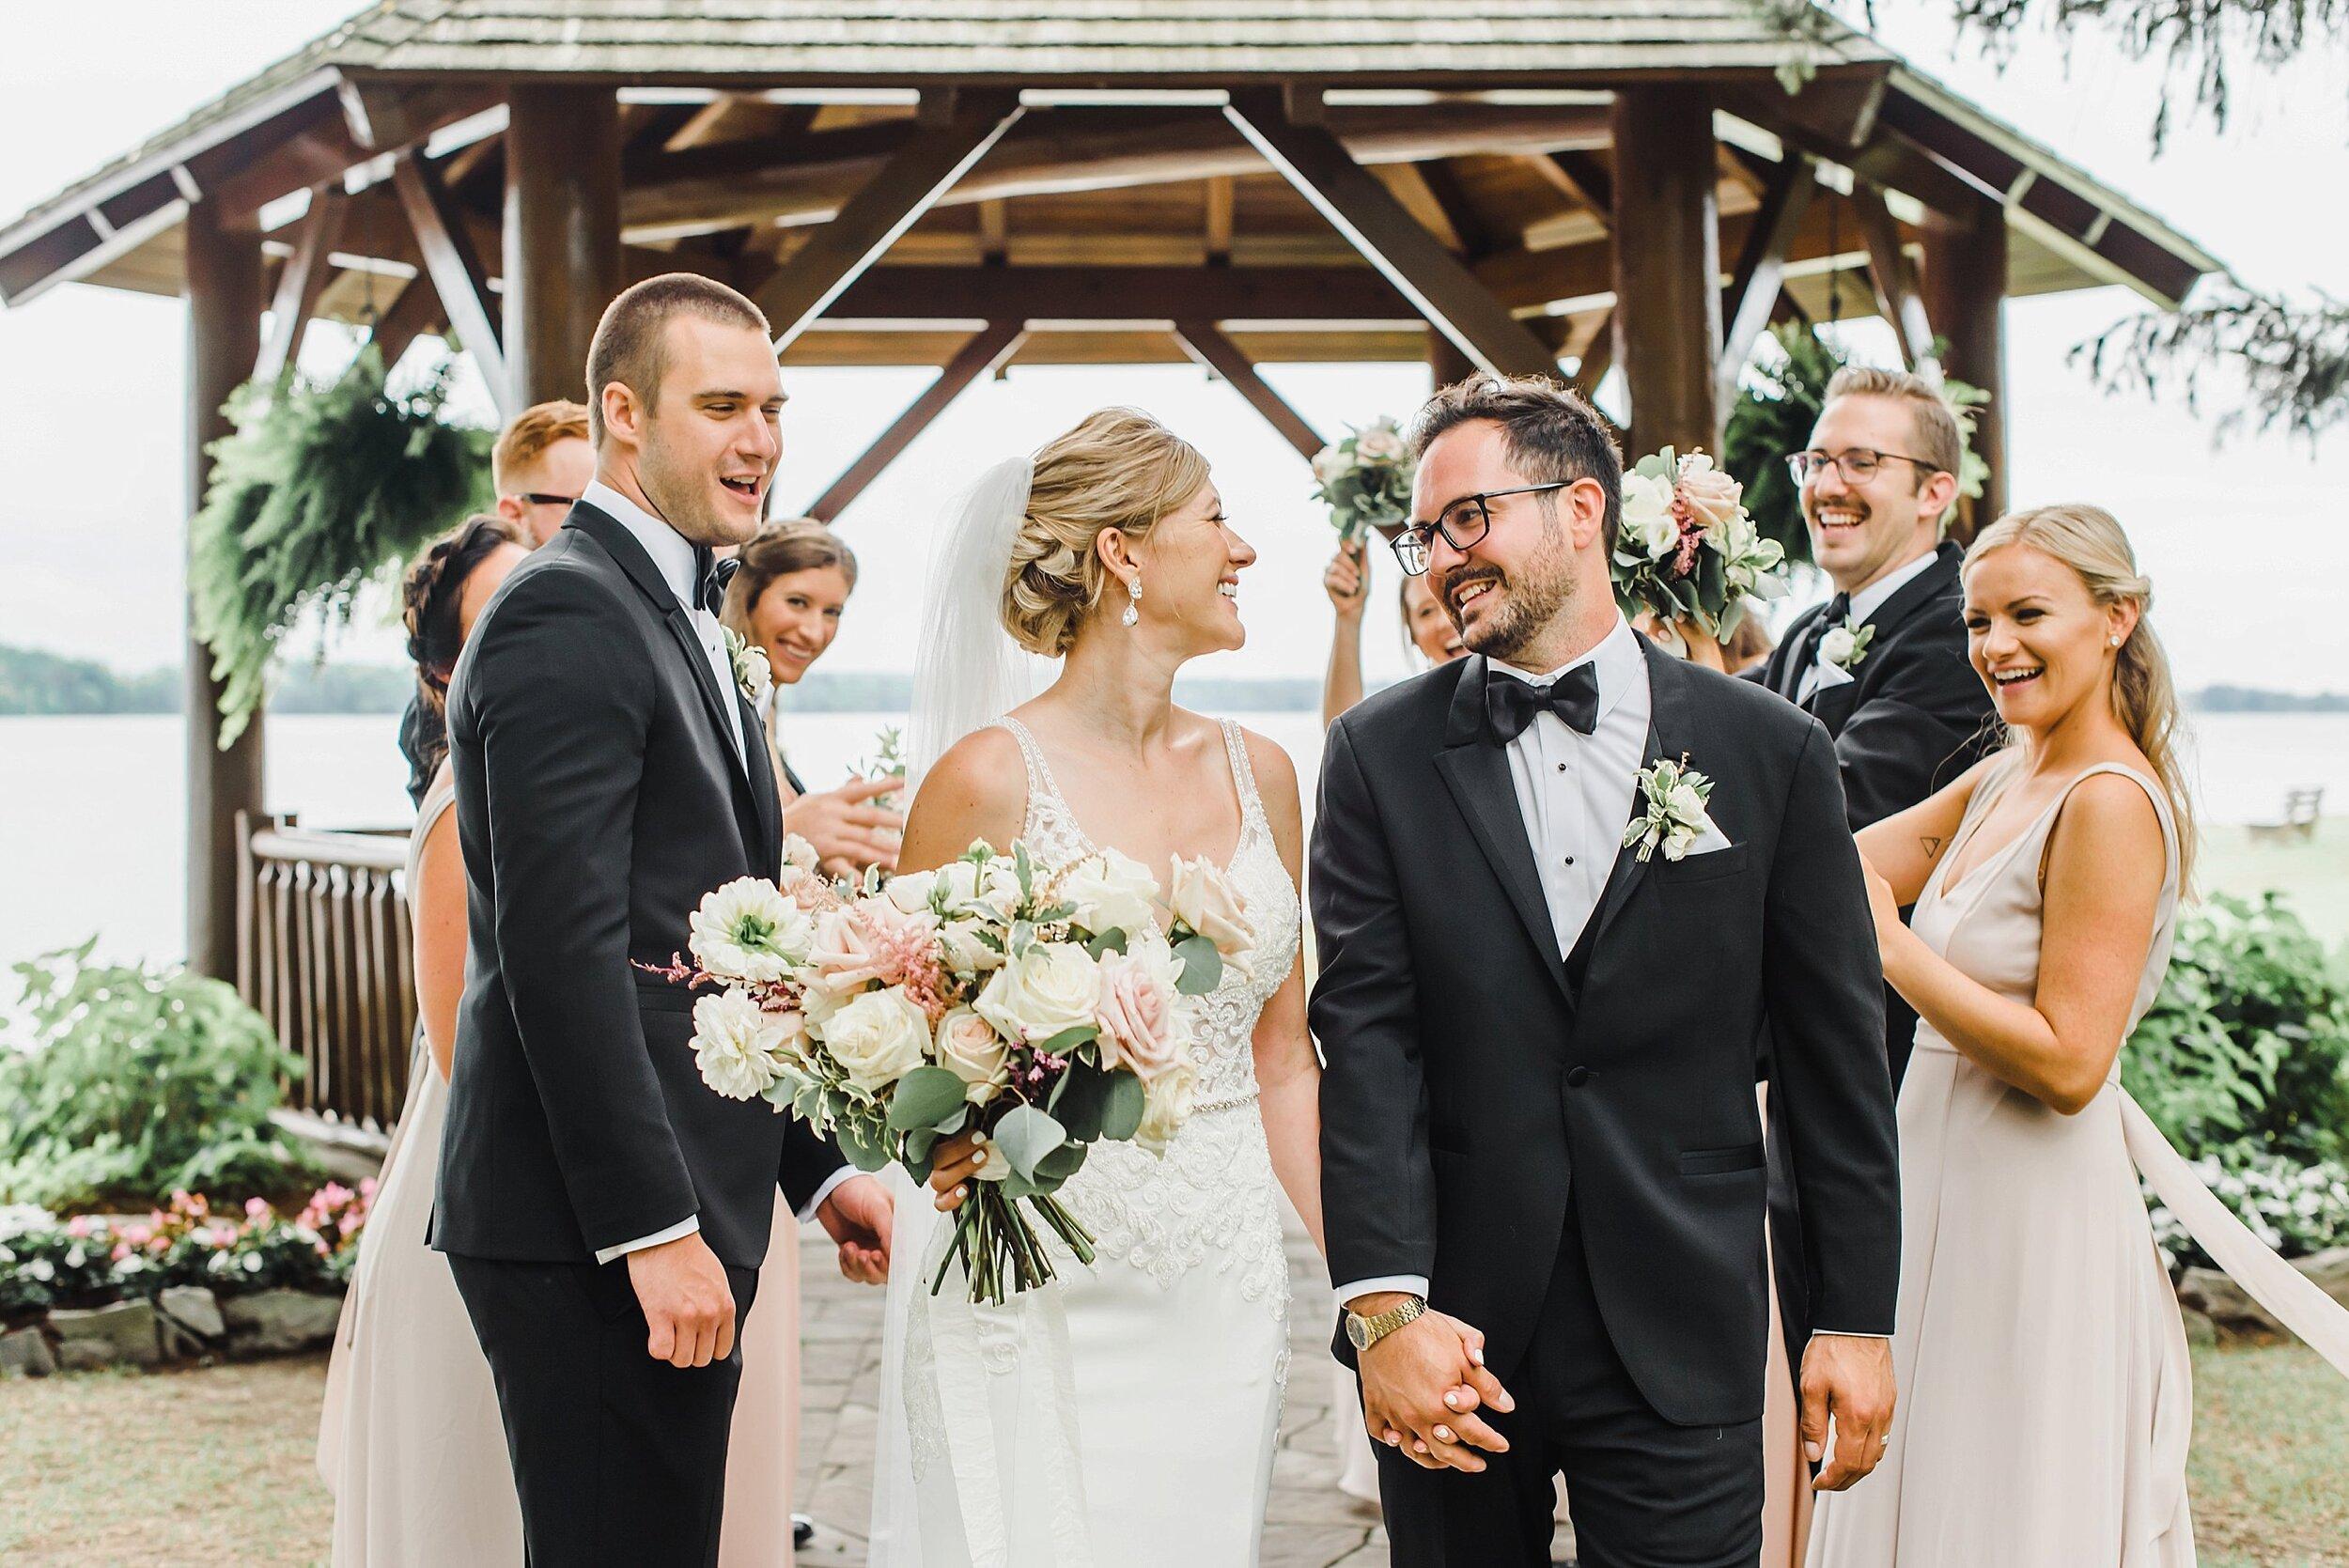 light airy fine art ottawa wedding photographer | Ali and Batoul Photography | Fairmont Le Chateau Montebello47.jpg